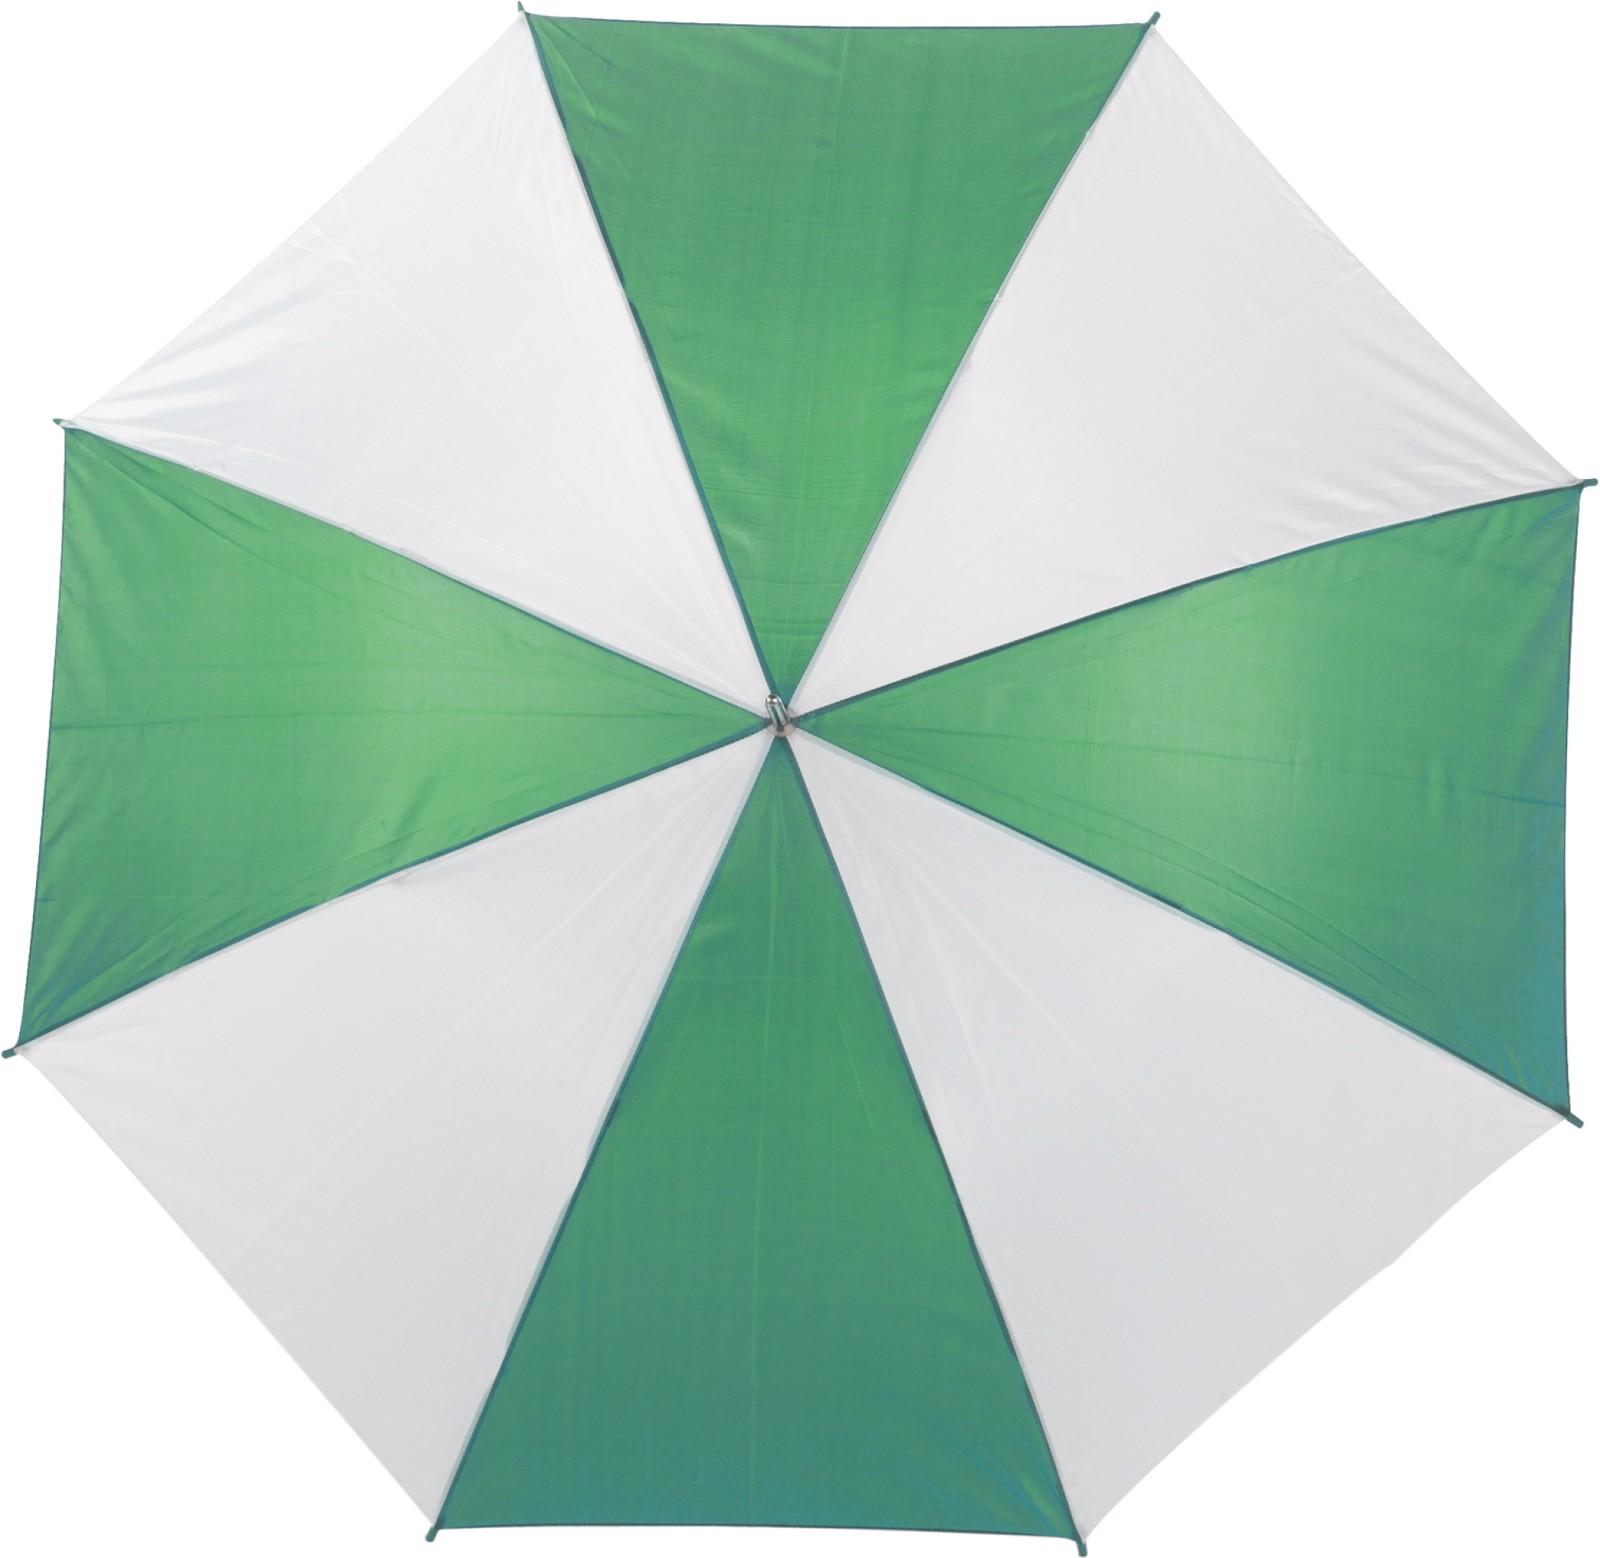 Polyester (190T) umbrella - Green / White